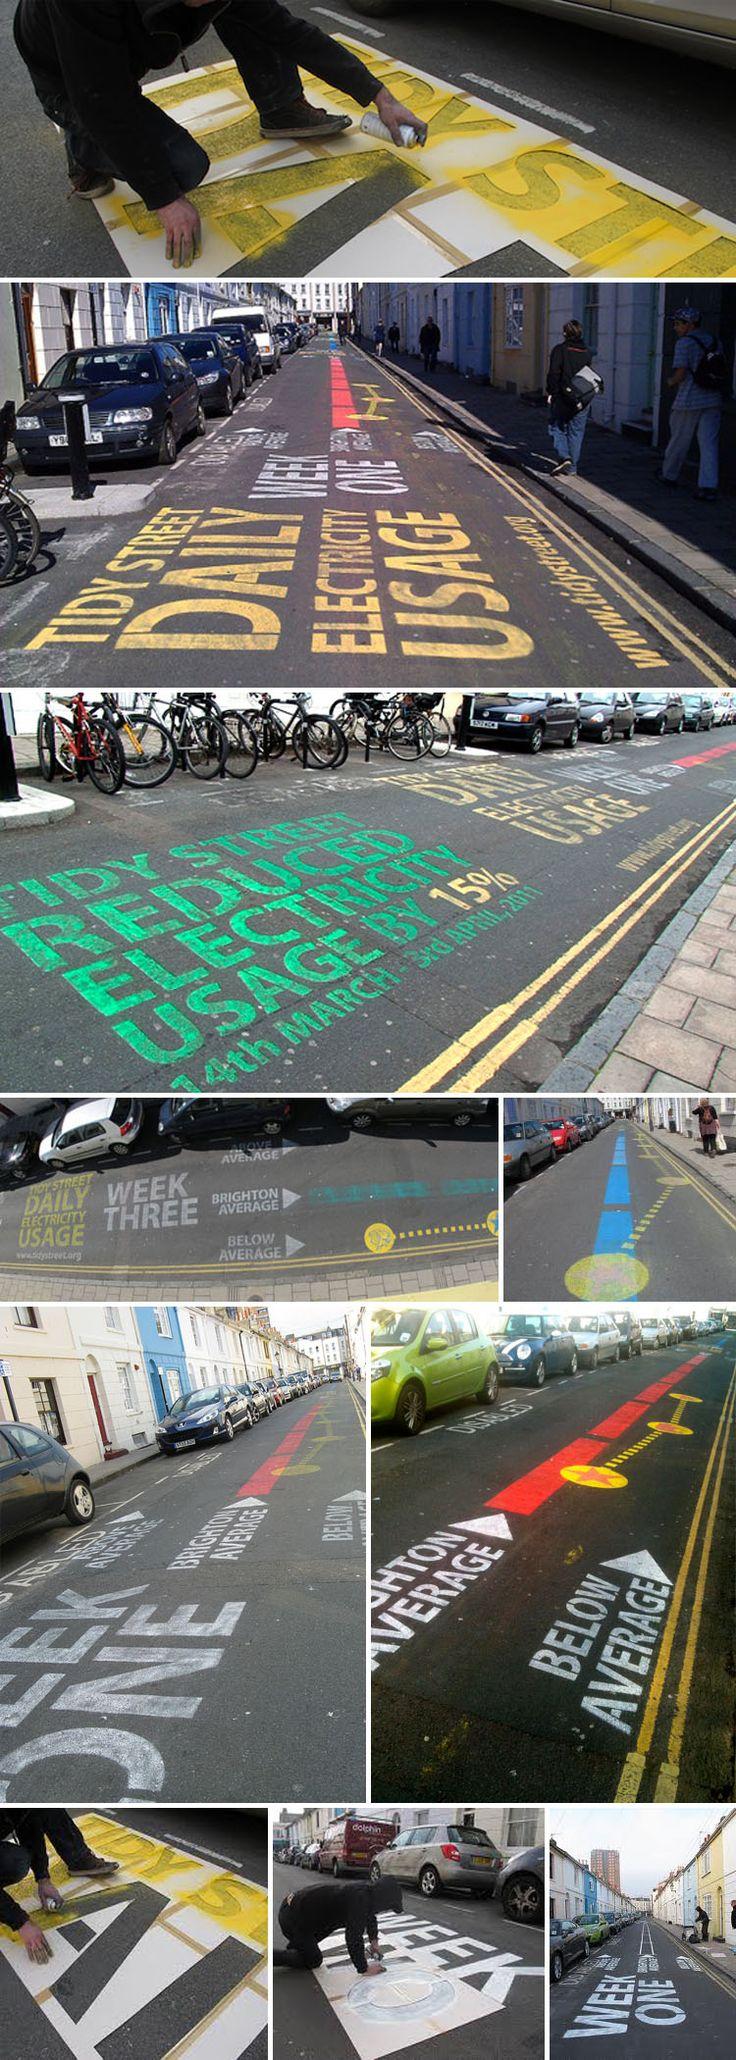 the_tidy_street_pro environmental behaviour change in Brighton, England, UK.